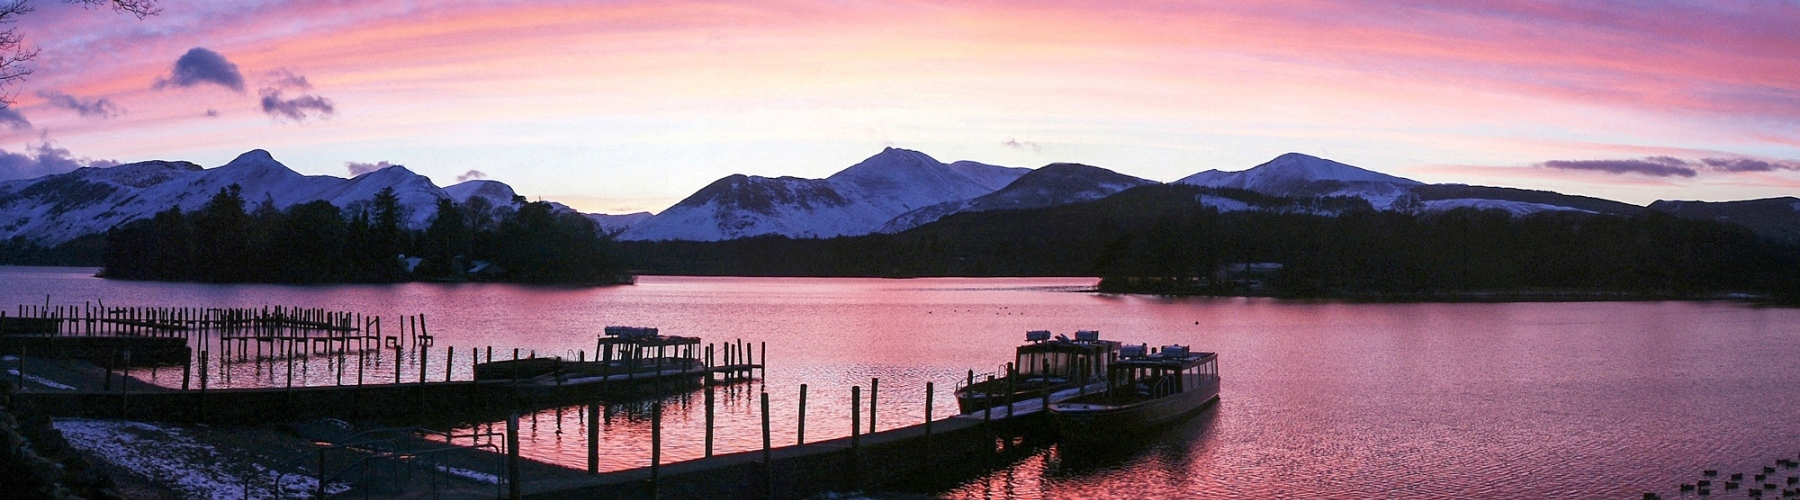 P0042-January-sunset-on-Derwent-Water